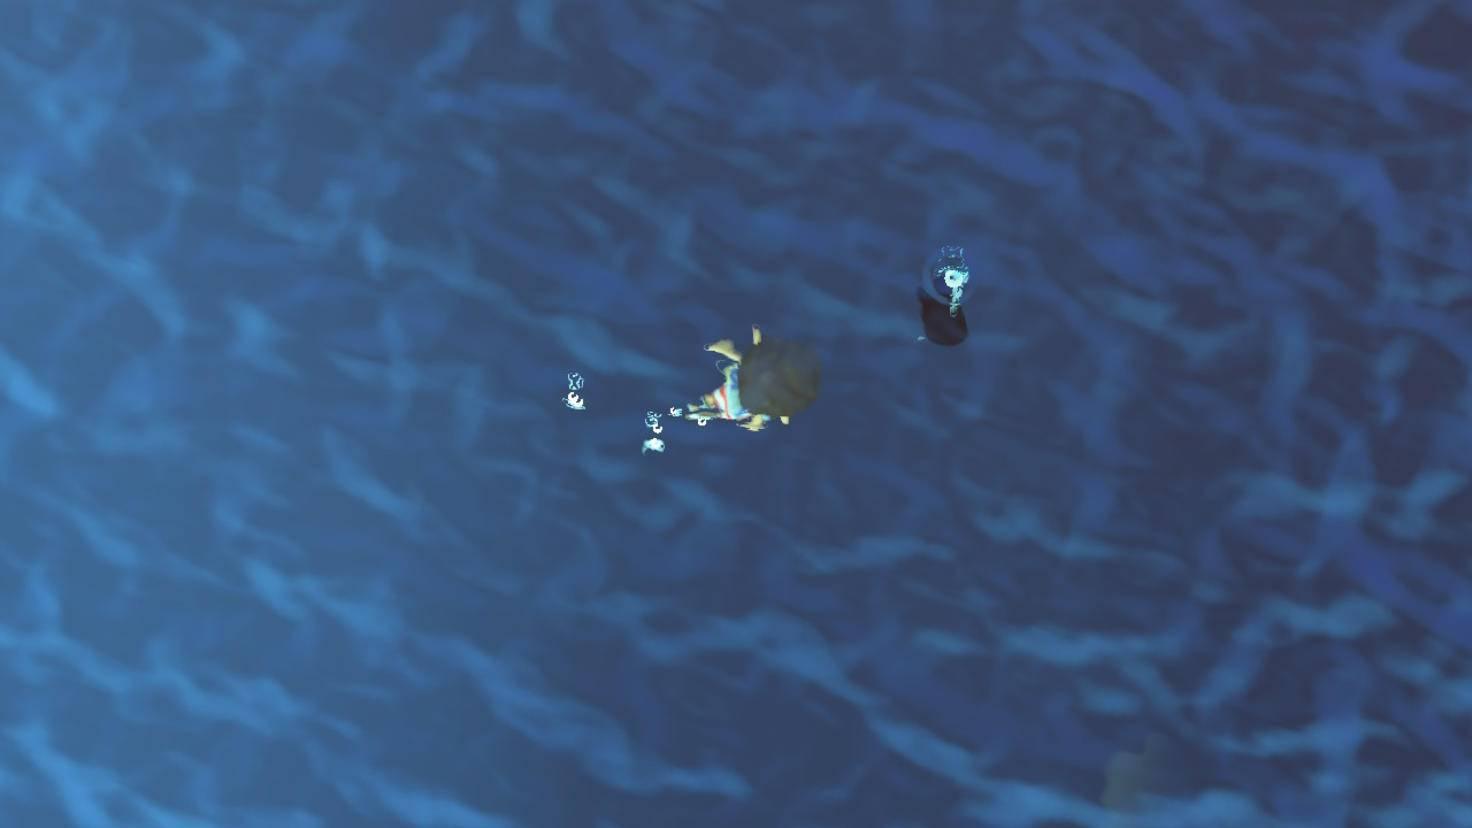 animal-crossing-new-horizons-tauchen-luftblasen